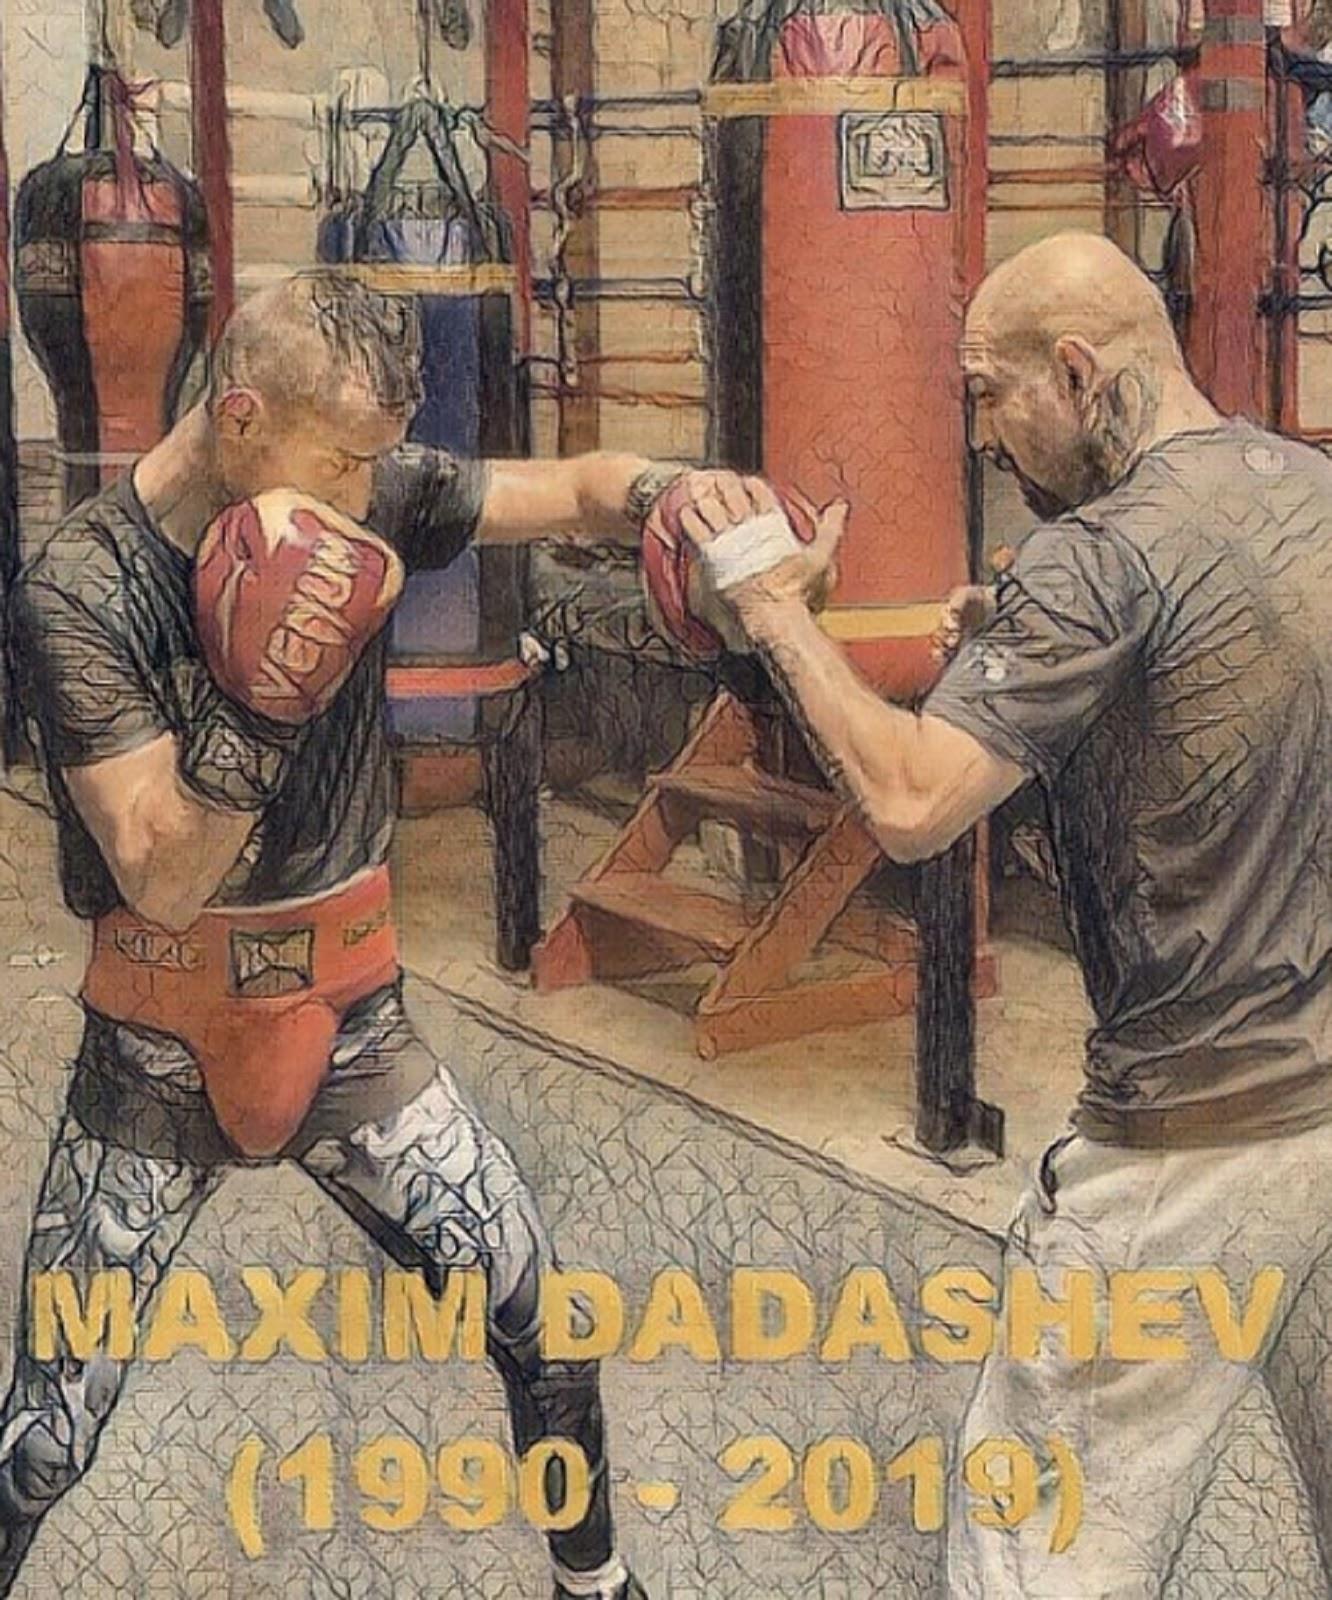 MAXIM DADASHEV 3